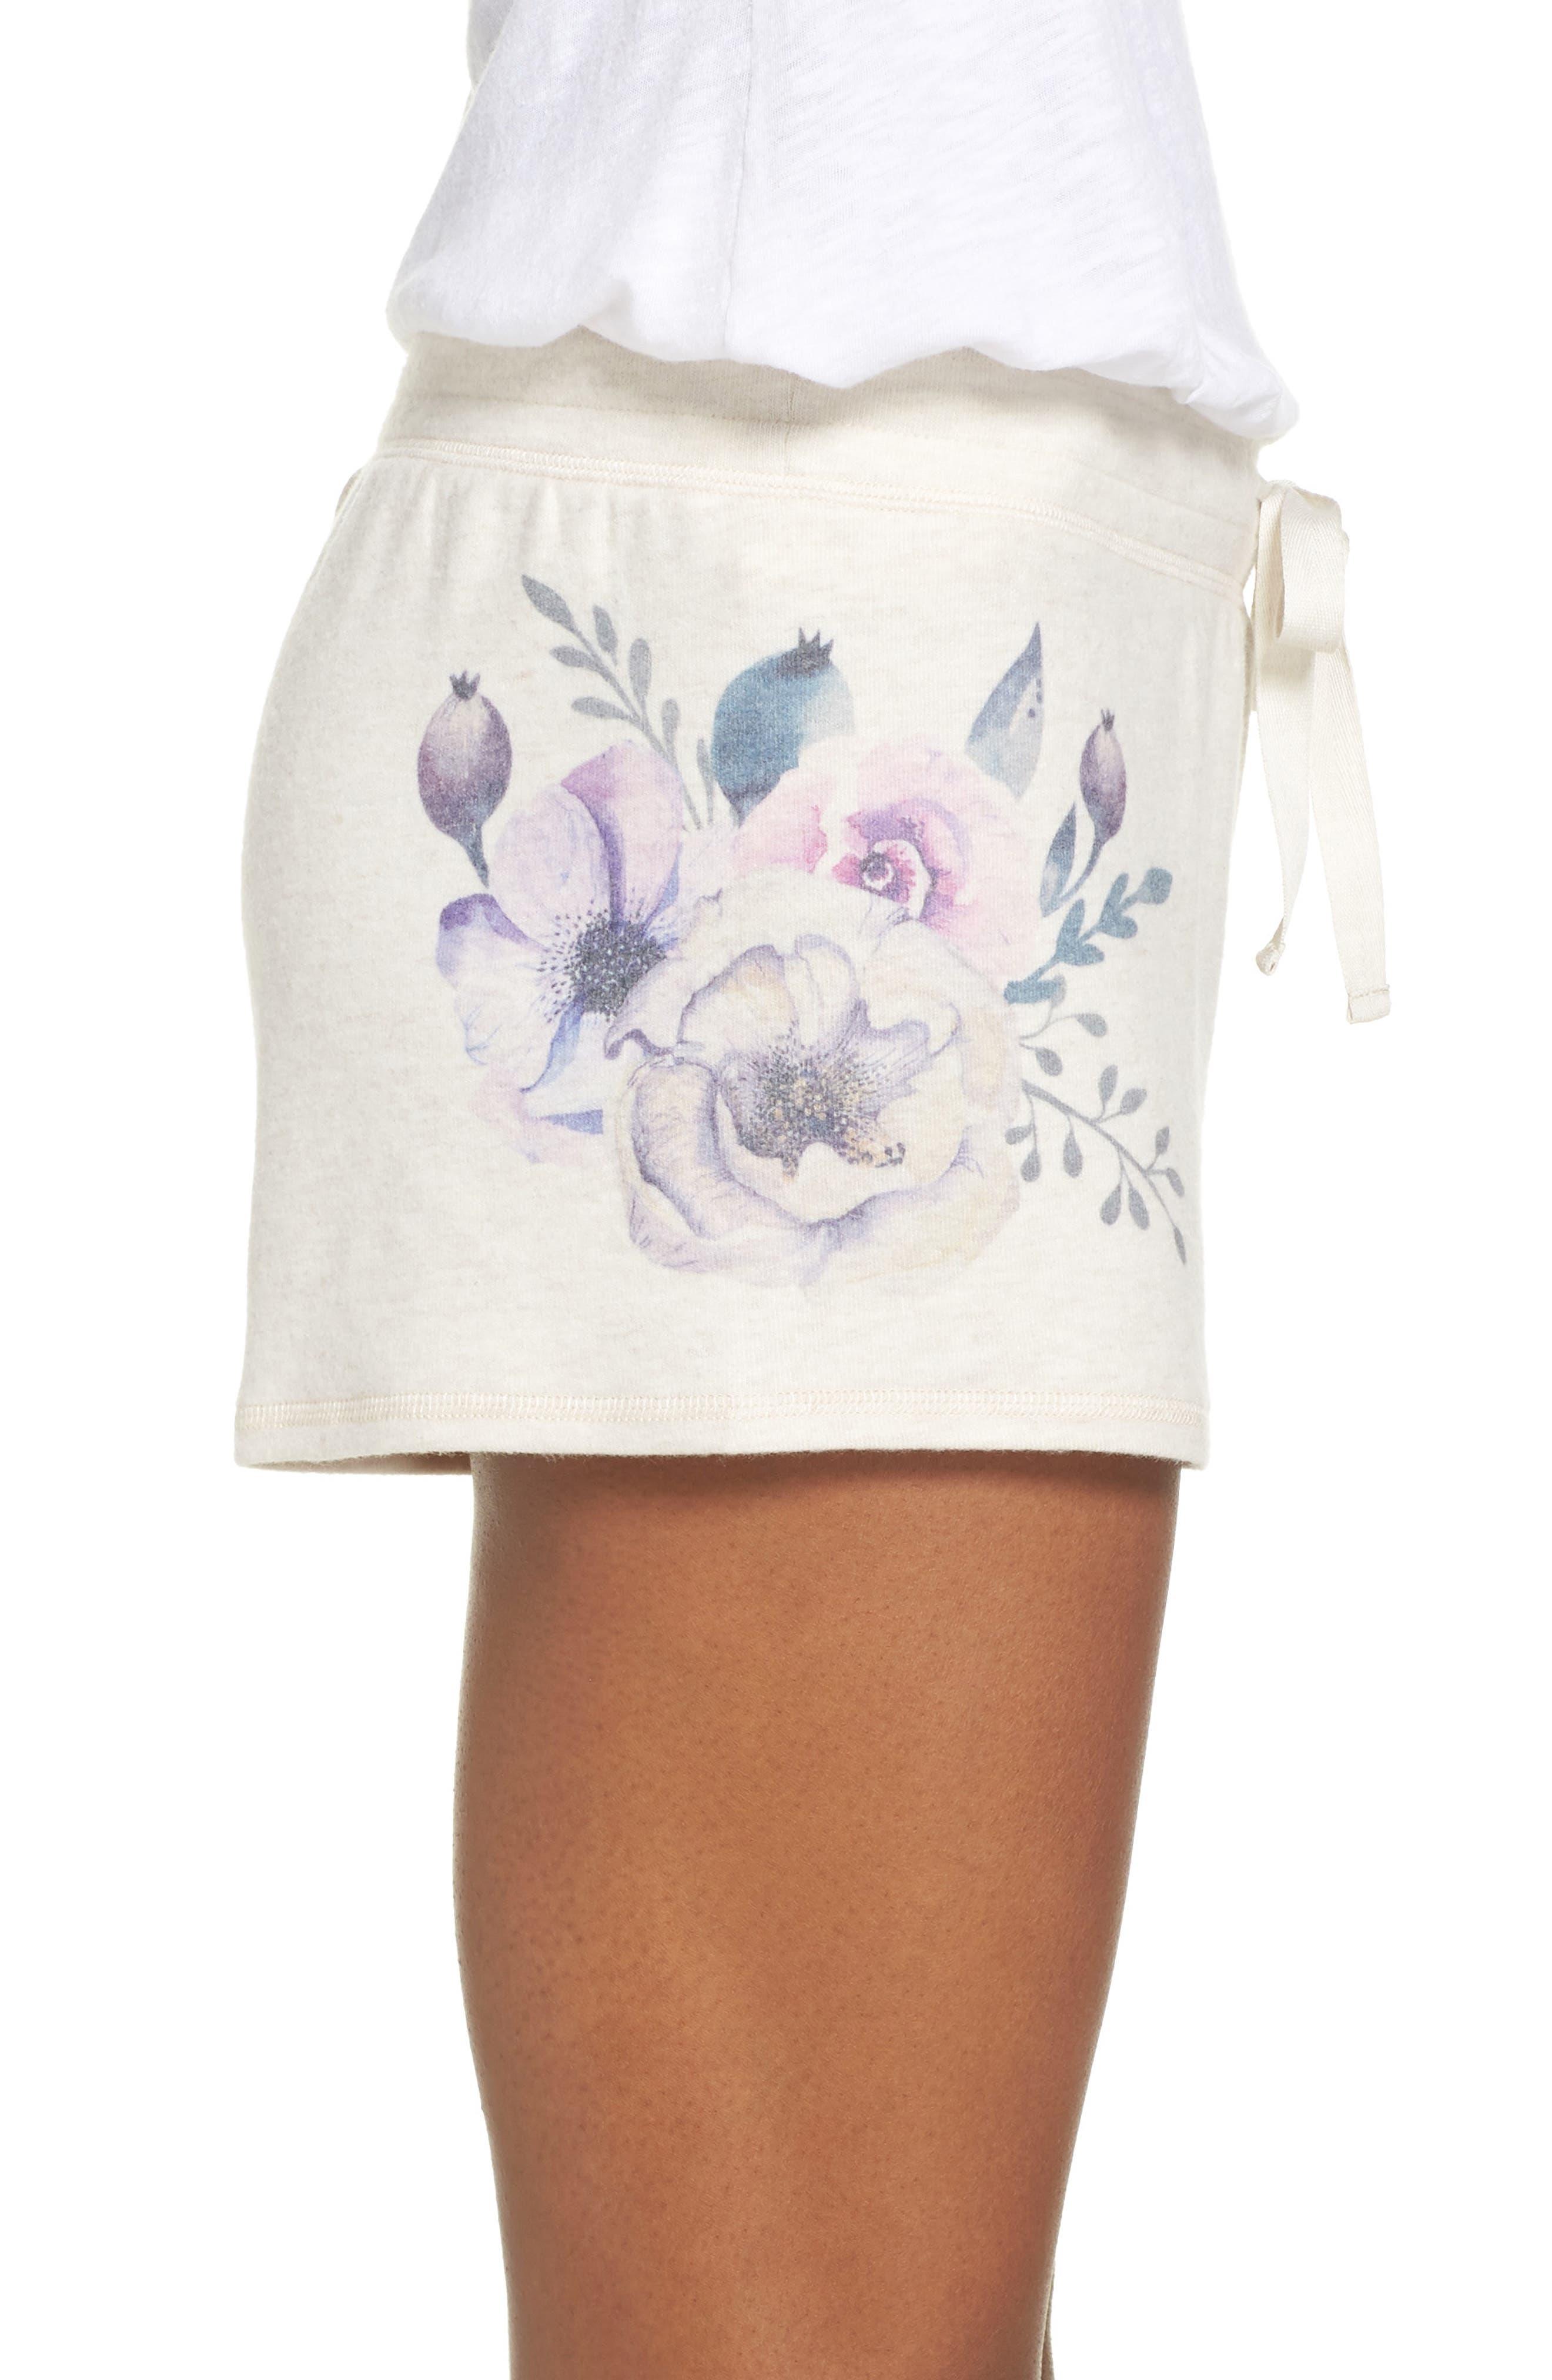 Peachy Floral Pajama Shorts,                             Alternate thumbnail 3, color,                             900